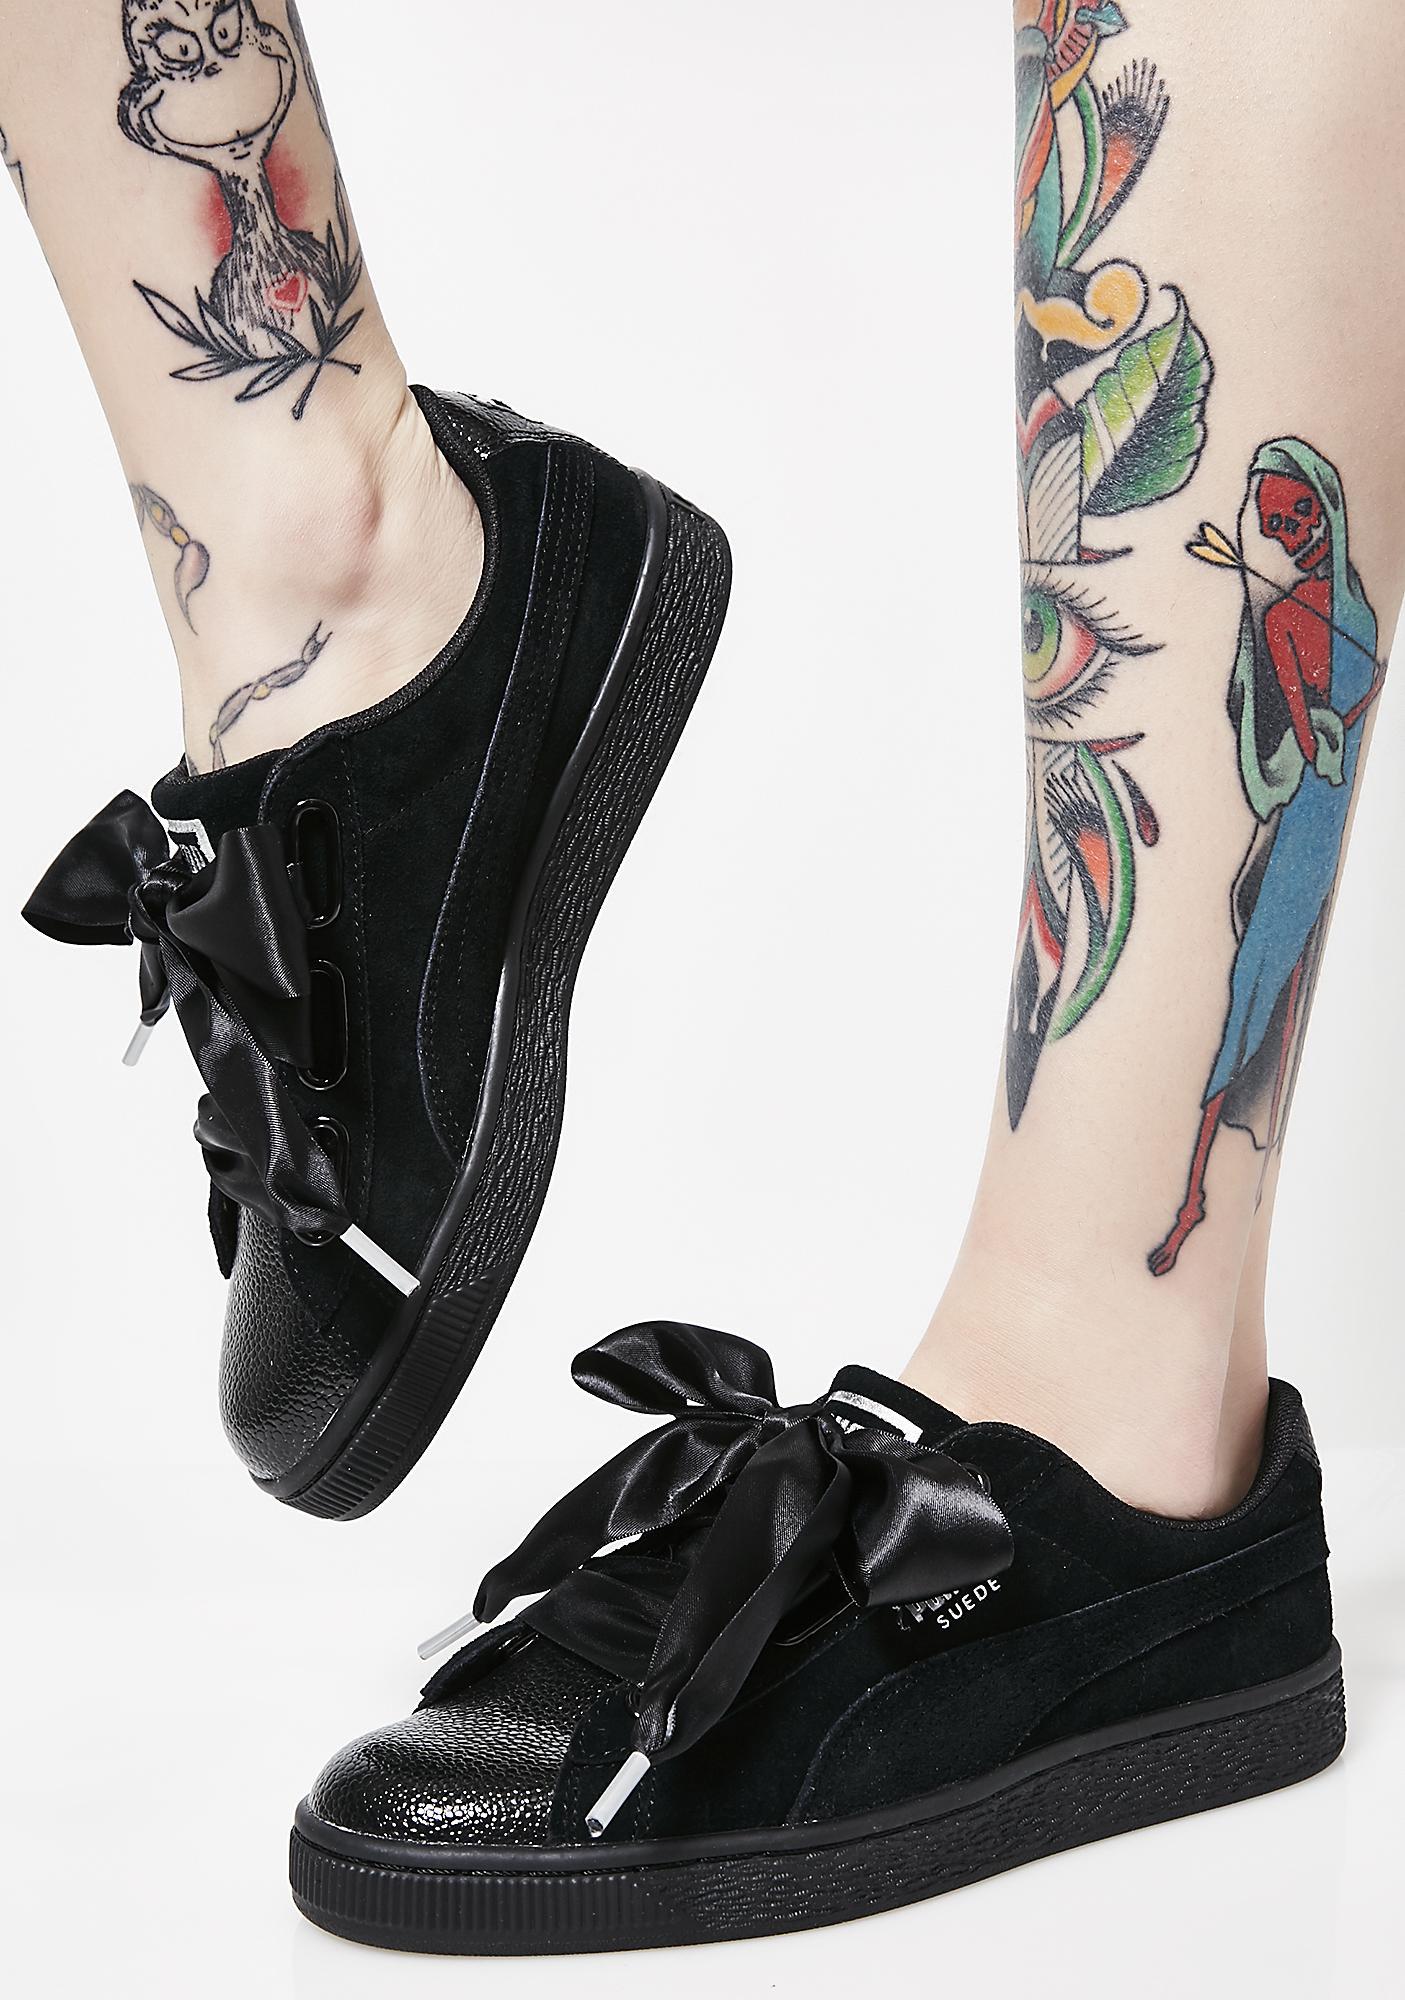 Heart Suede Bubble Bubble Sneakers Suede Sneakers Heart CxBWedro